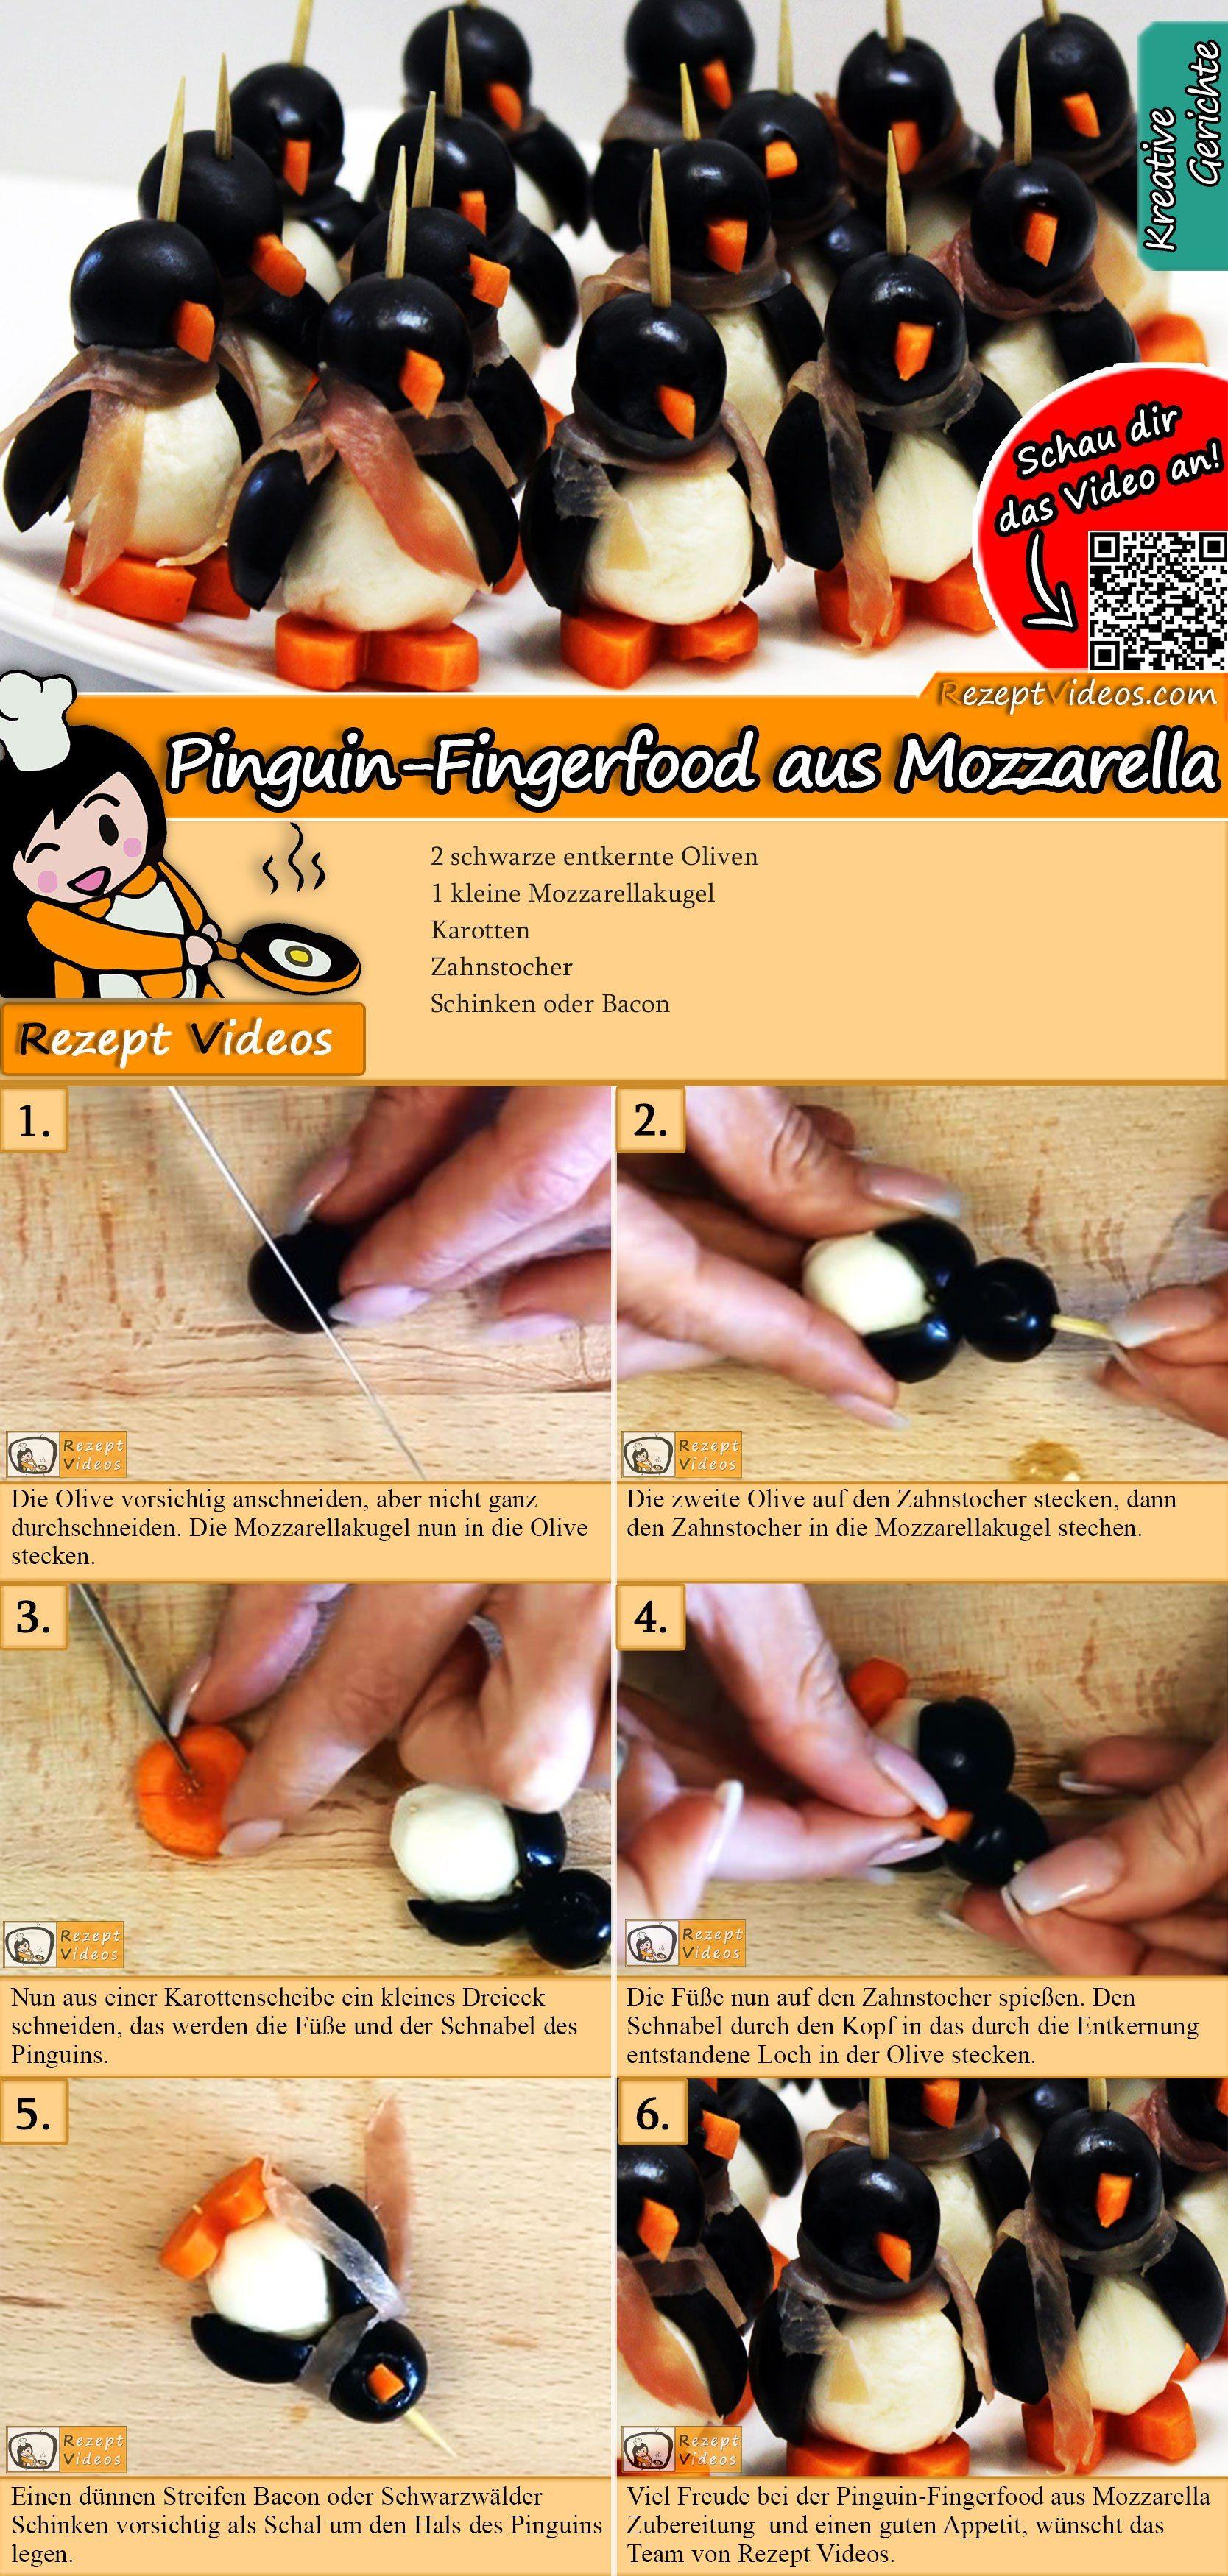 Pinguin-Fingerfood aus Mozzarella Rezept mit Video - Fingerfood